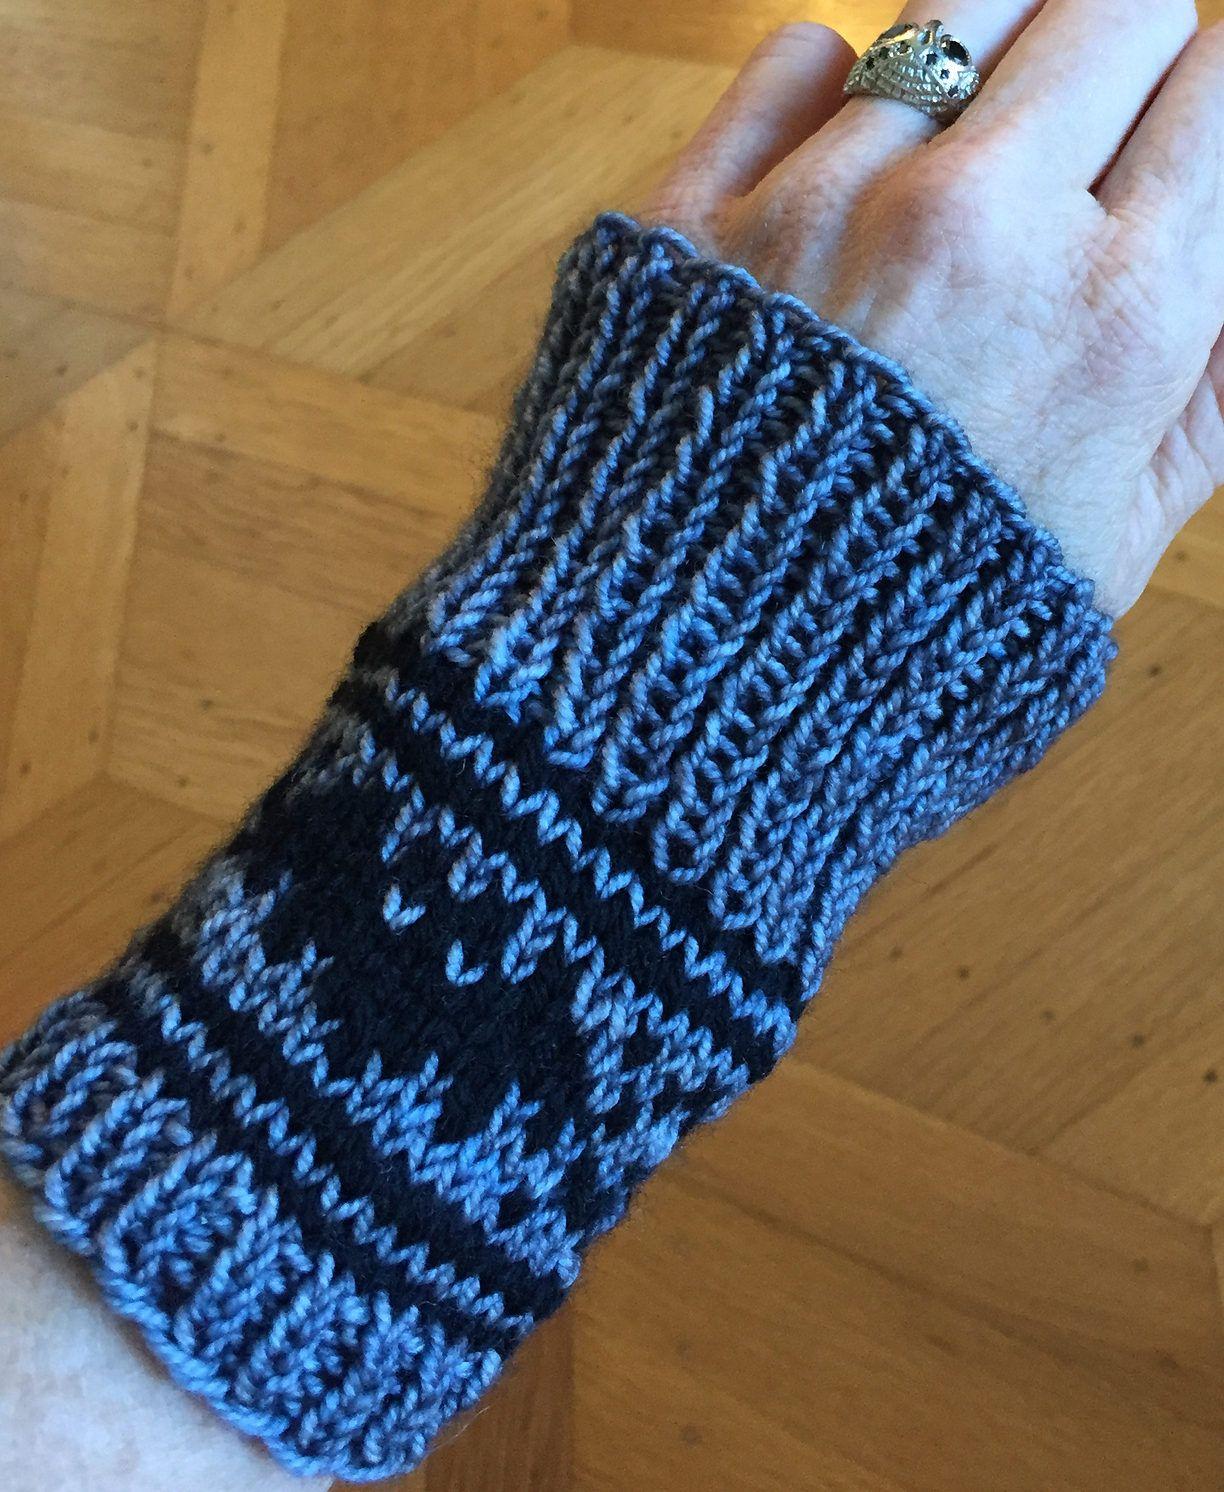 Free Knitting Pattern for Bat Fingerless Mitts - Gone Batty: Simple ...